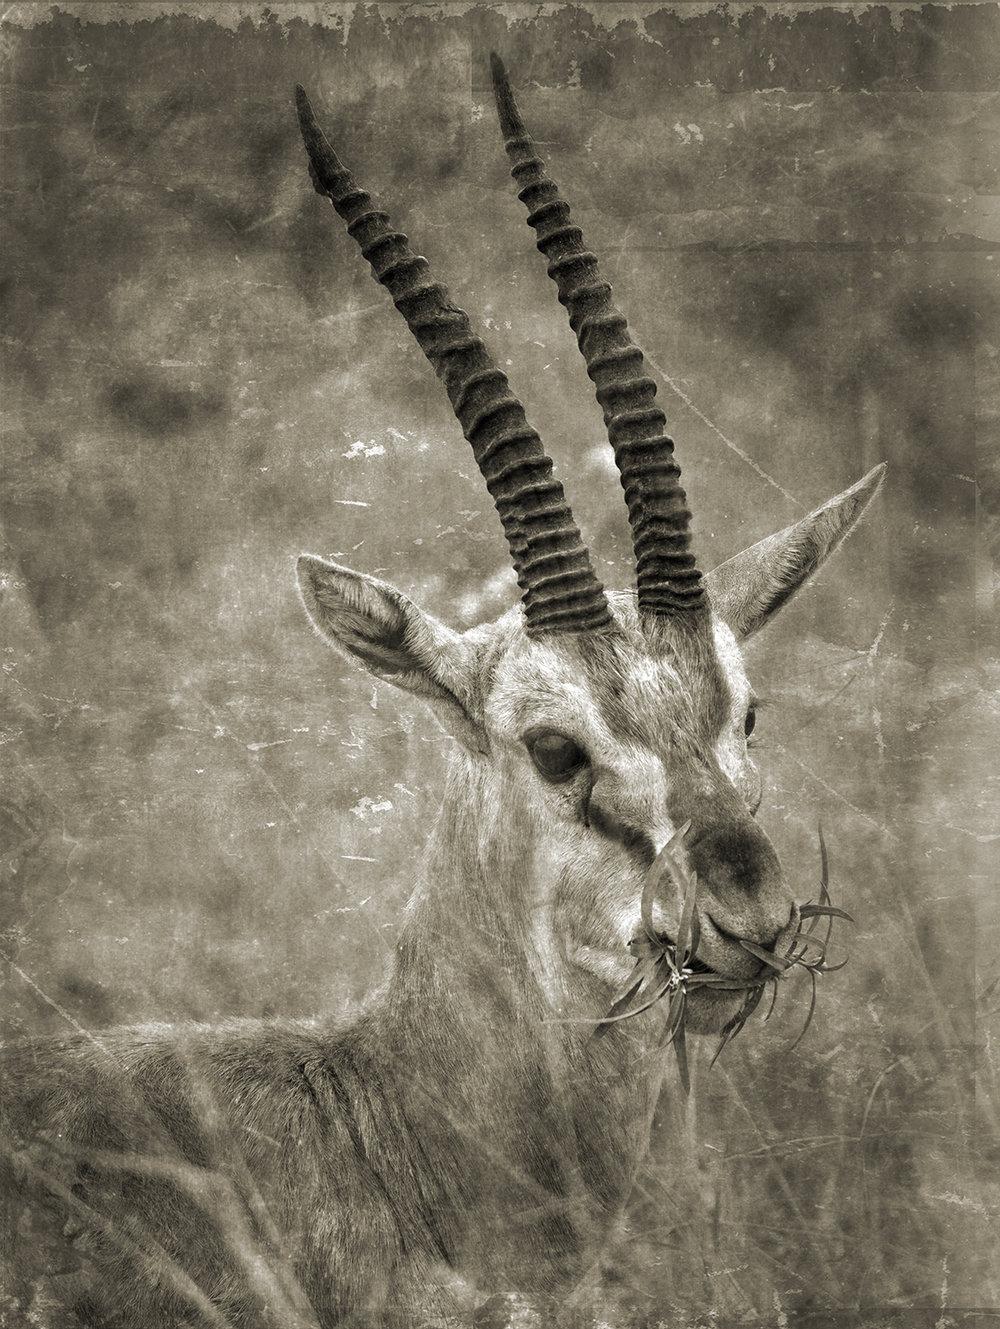 Gazelle with Food_7352 copy.jpg